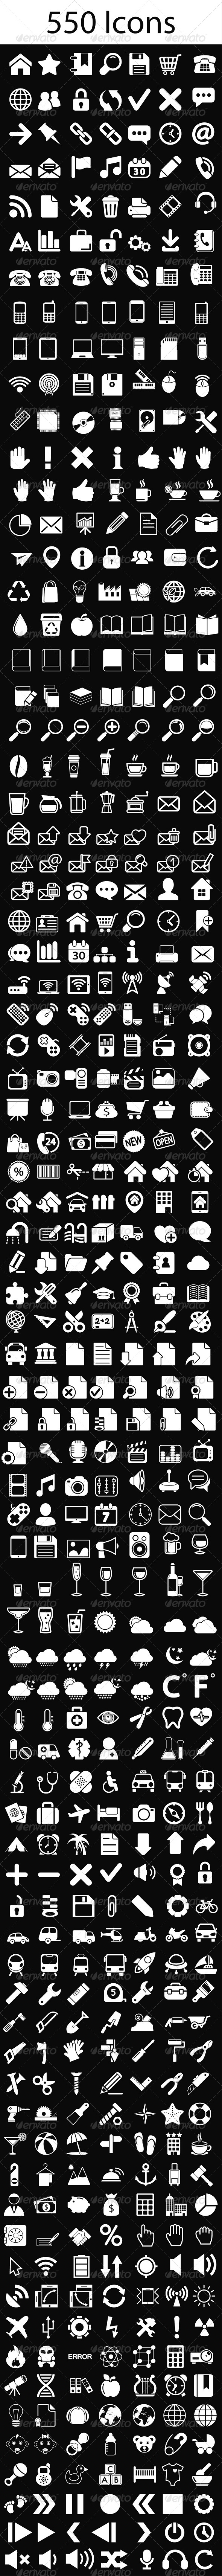 GraphicRiver White Icons Set 6803422